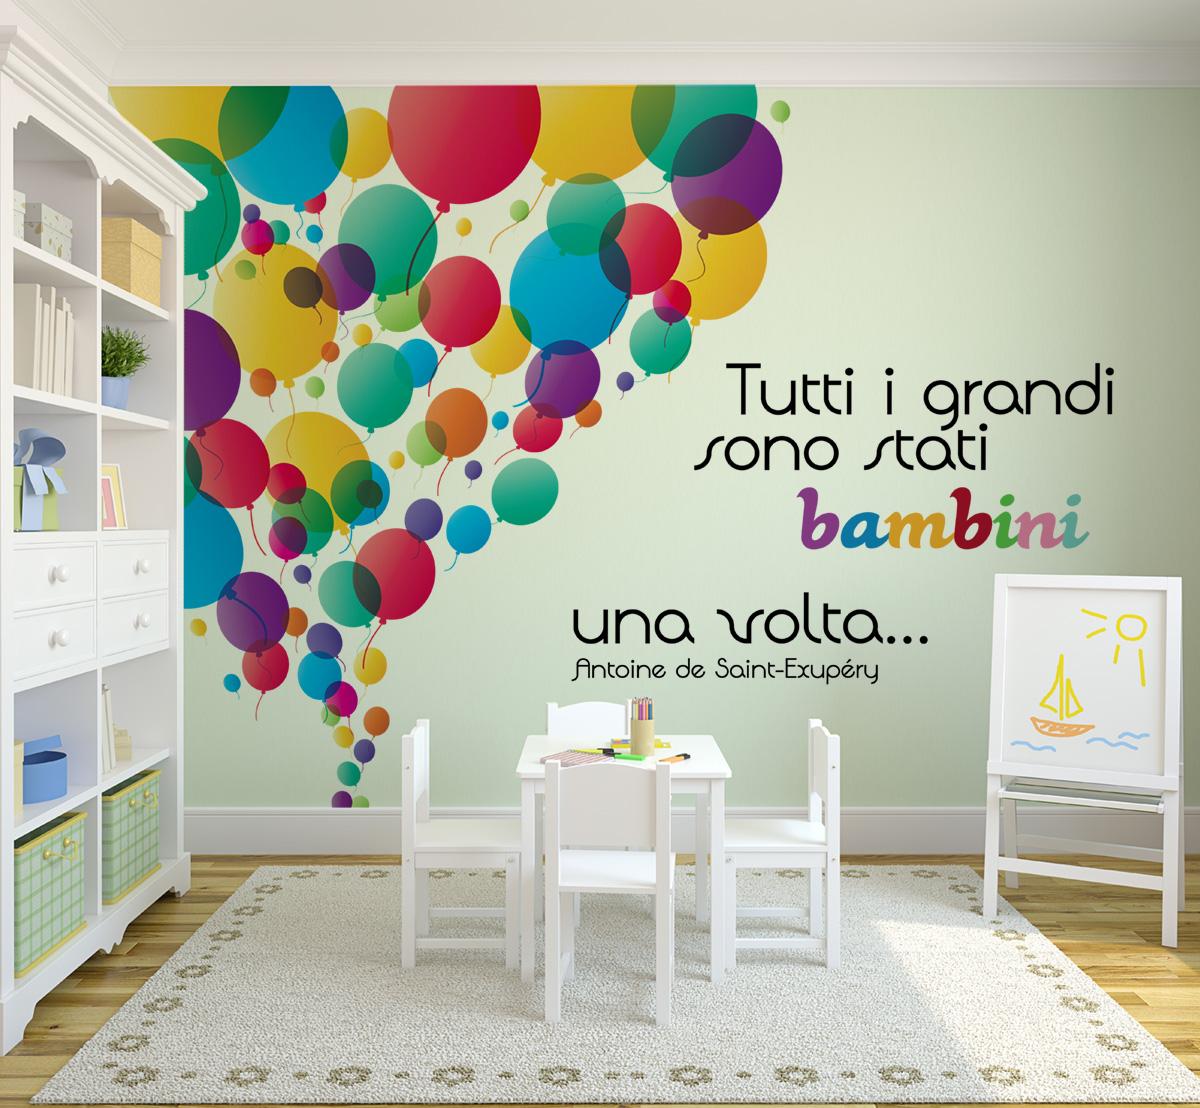 100 sticker pareti bambini free bambini adesivi per - Stickers per pareti cameretta bambini ...